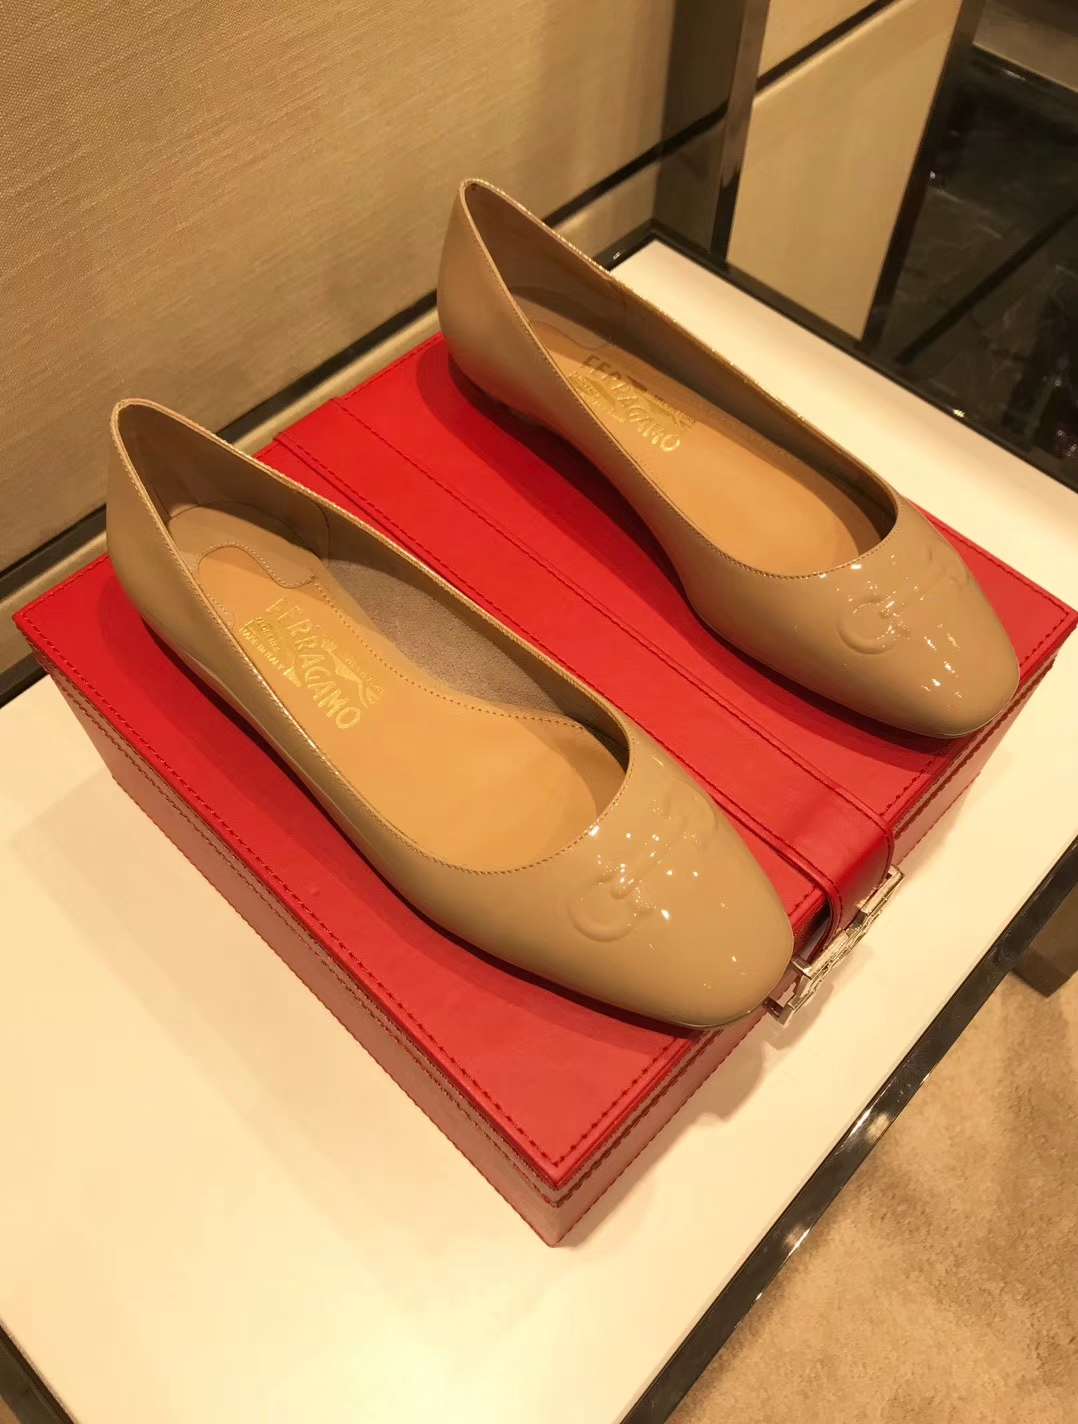 Salvatore Ferragamo菲拉格慕平底单鞋2018专柜同步发售